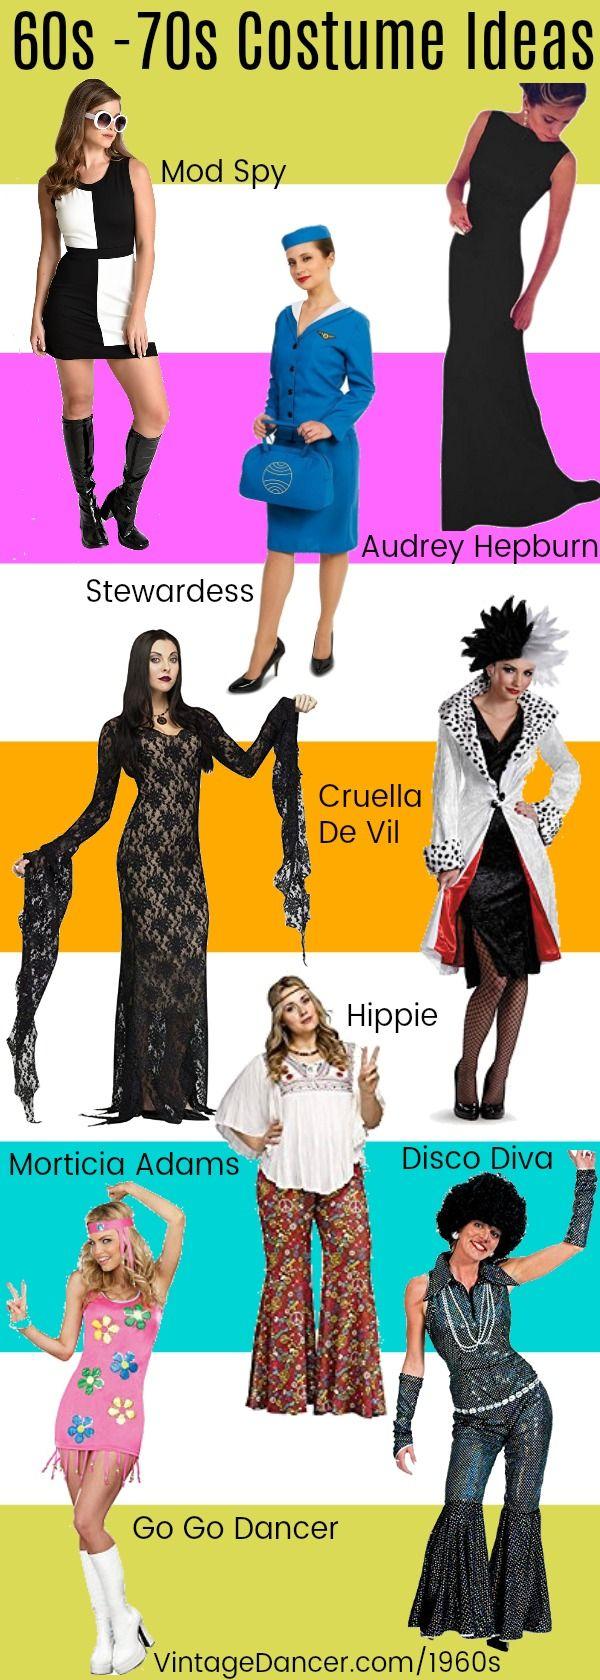 1960s-1970s Costume Ideas - Hippie, Disco, Stewardess, Morticia Adams, Audrey Hepburn, Spy, Go Go Dancer, Cruella De Vil, and more at VintageDancer.com/1960s